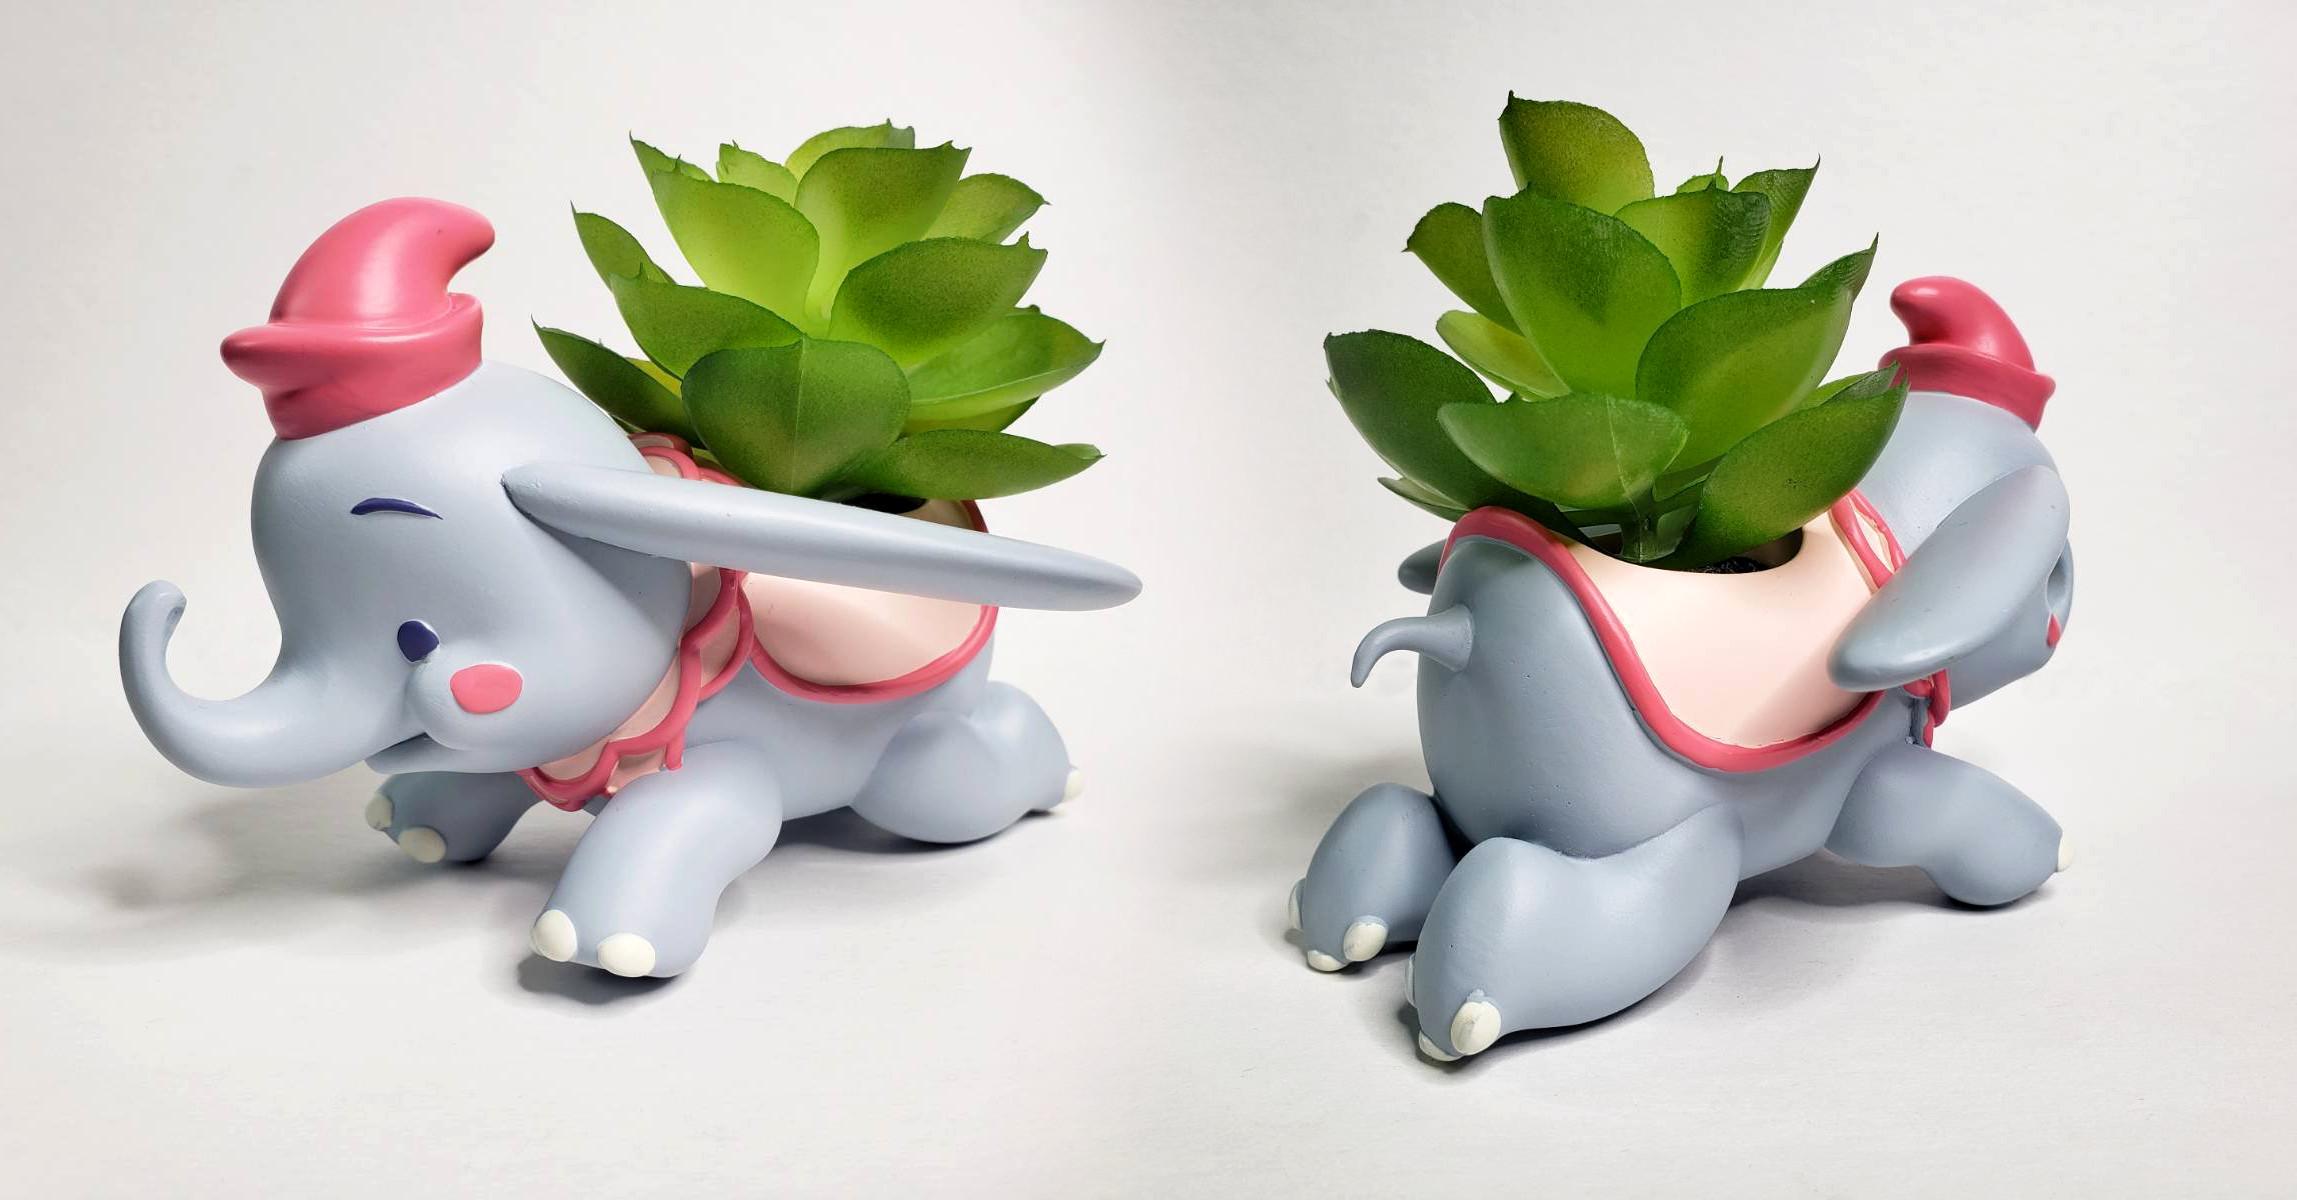 Dumbo Succulent Planter - Actual Product Image